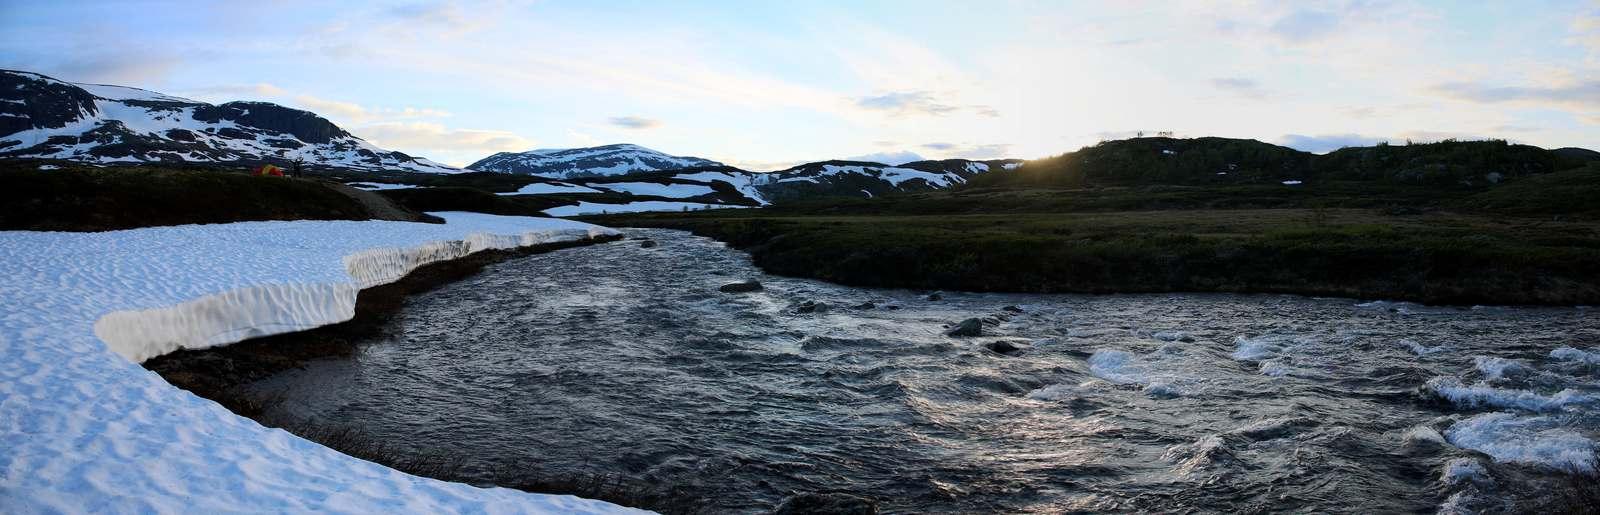 Helsport Fjellheimen X-Trem 2 Camp at the river bank. Hivjuåne, Skarvheimen, Norway © 2014 Knut Dalen